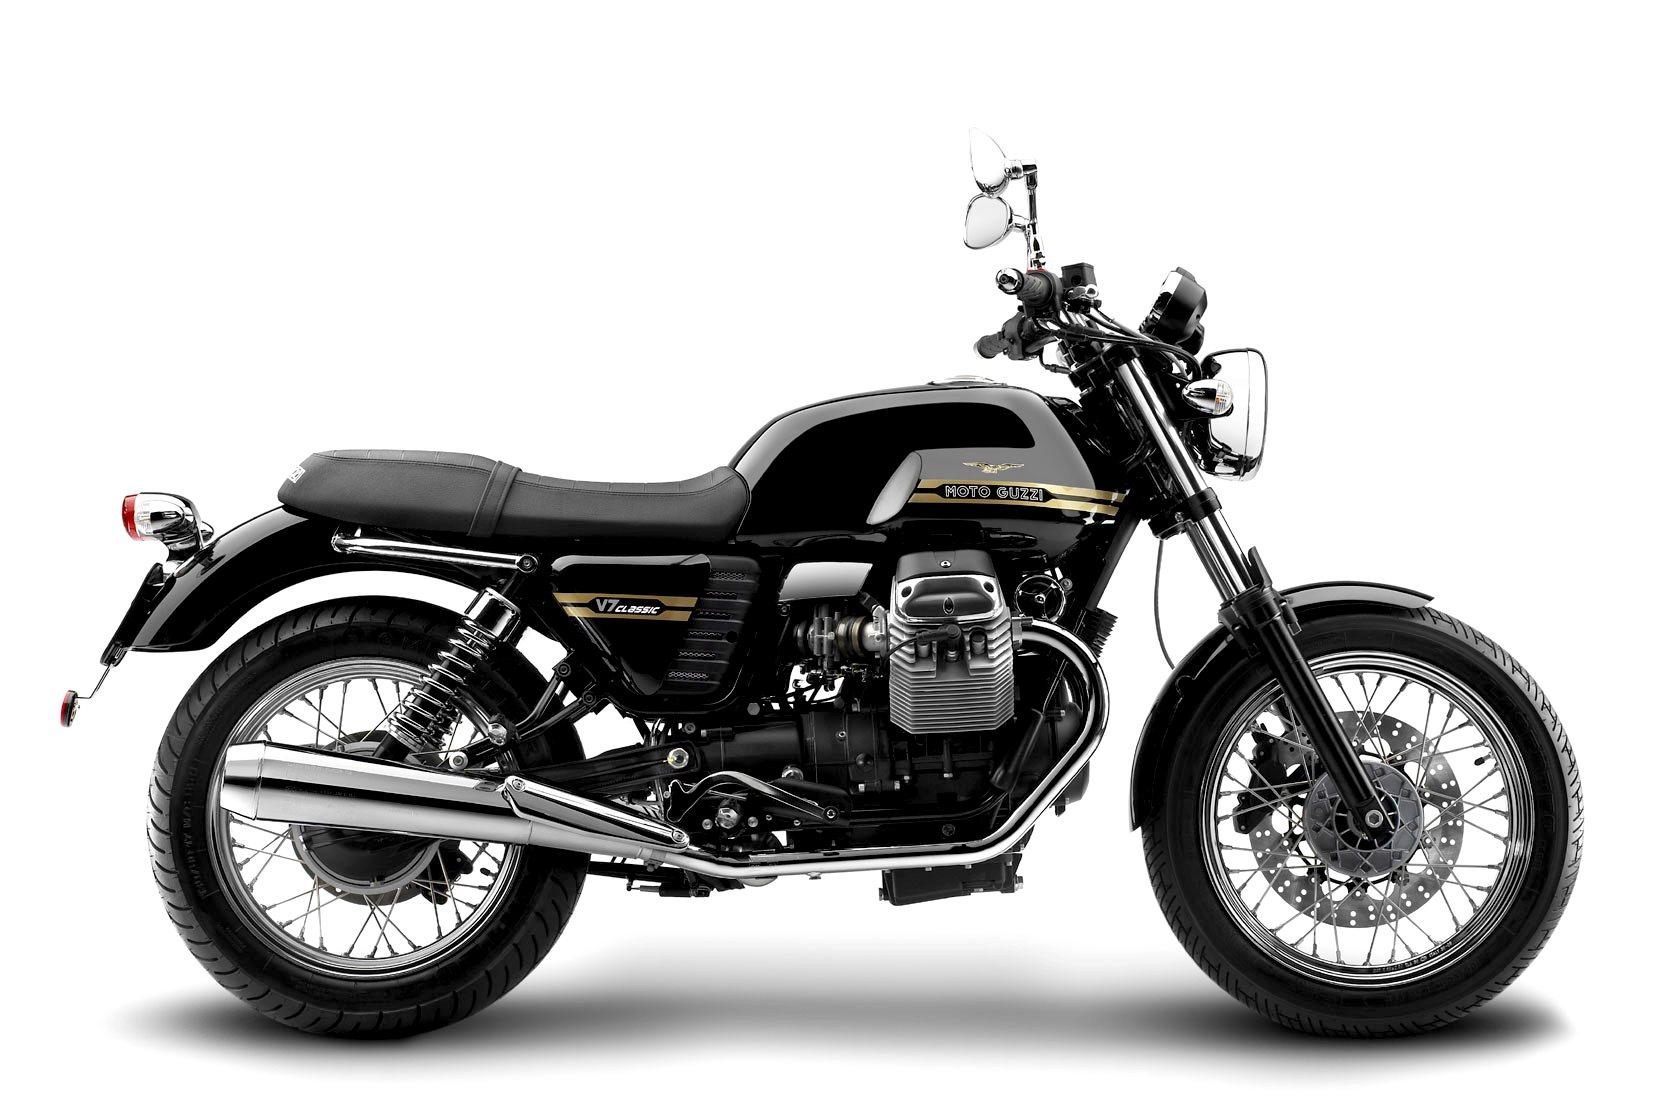 moto guzzi v7 classic 2008 2009 autoevolution. Black Bedroom Furniture Sets. Home Design Ideas